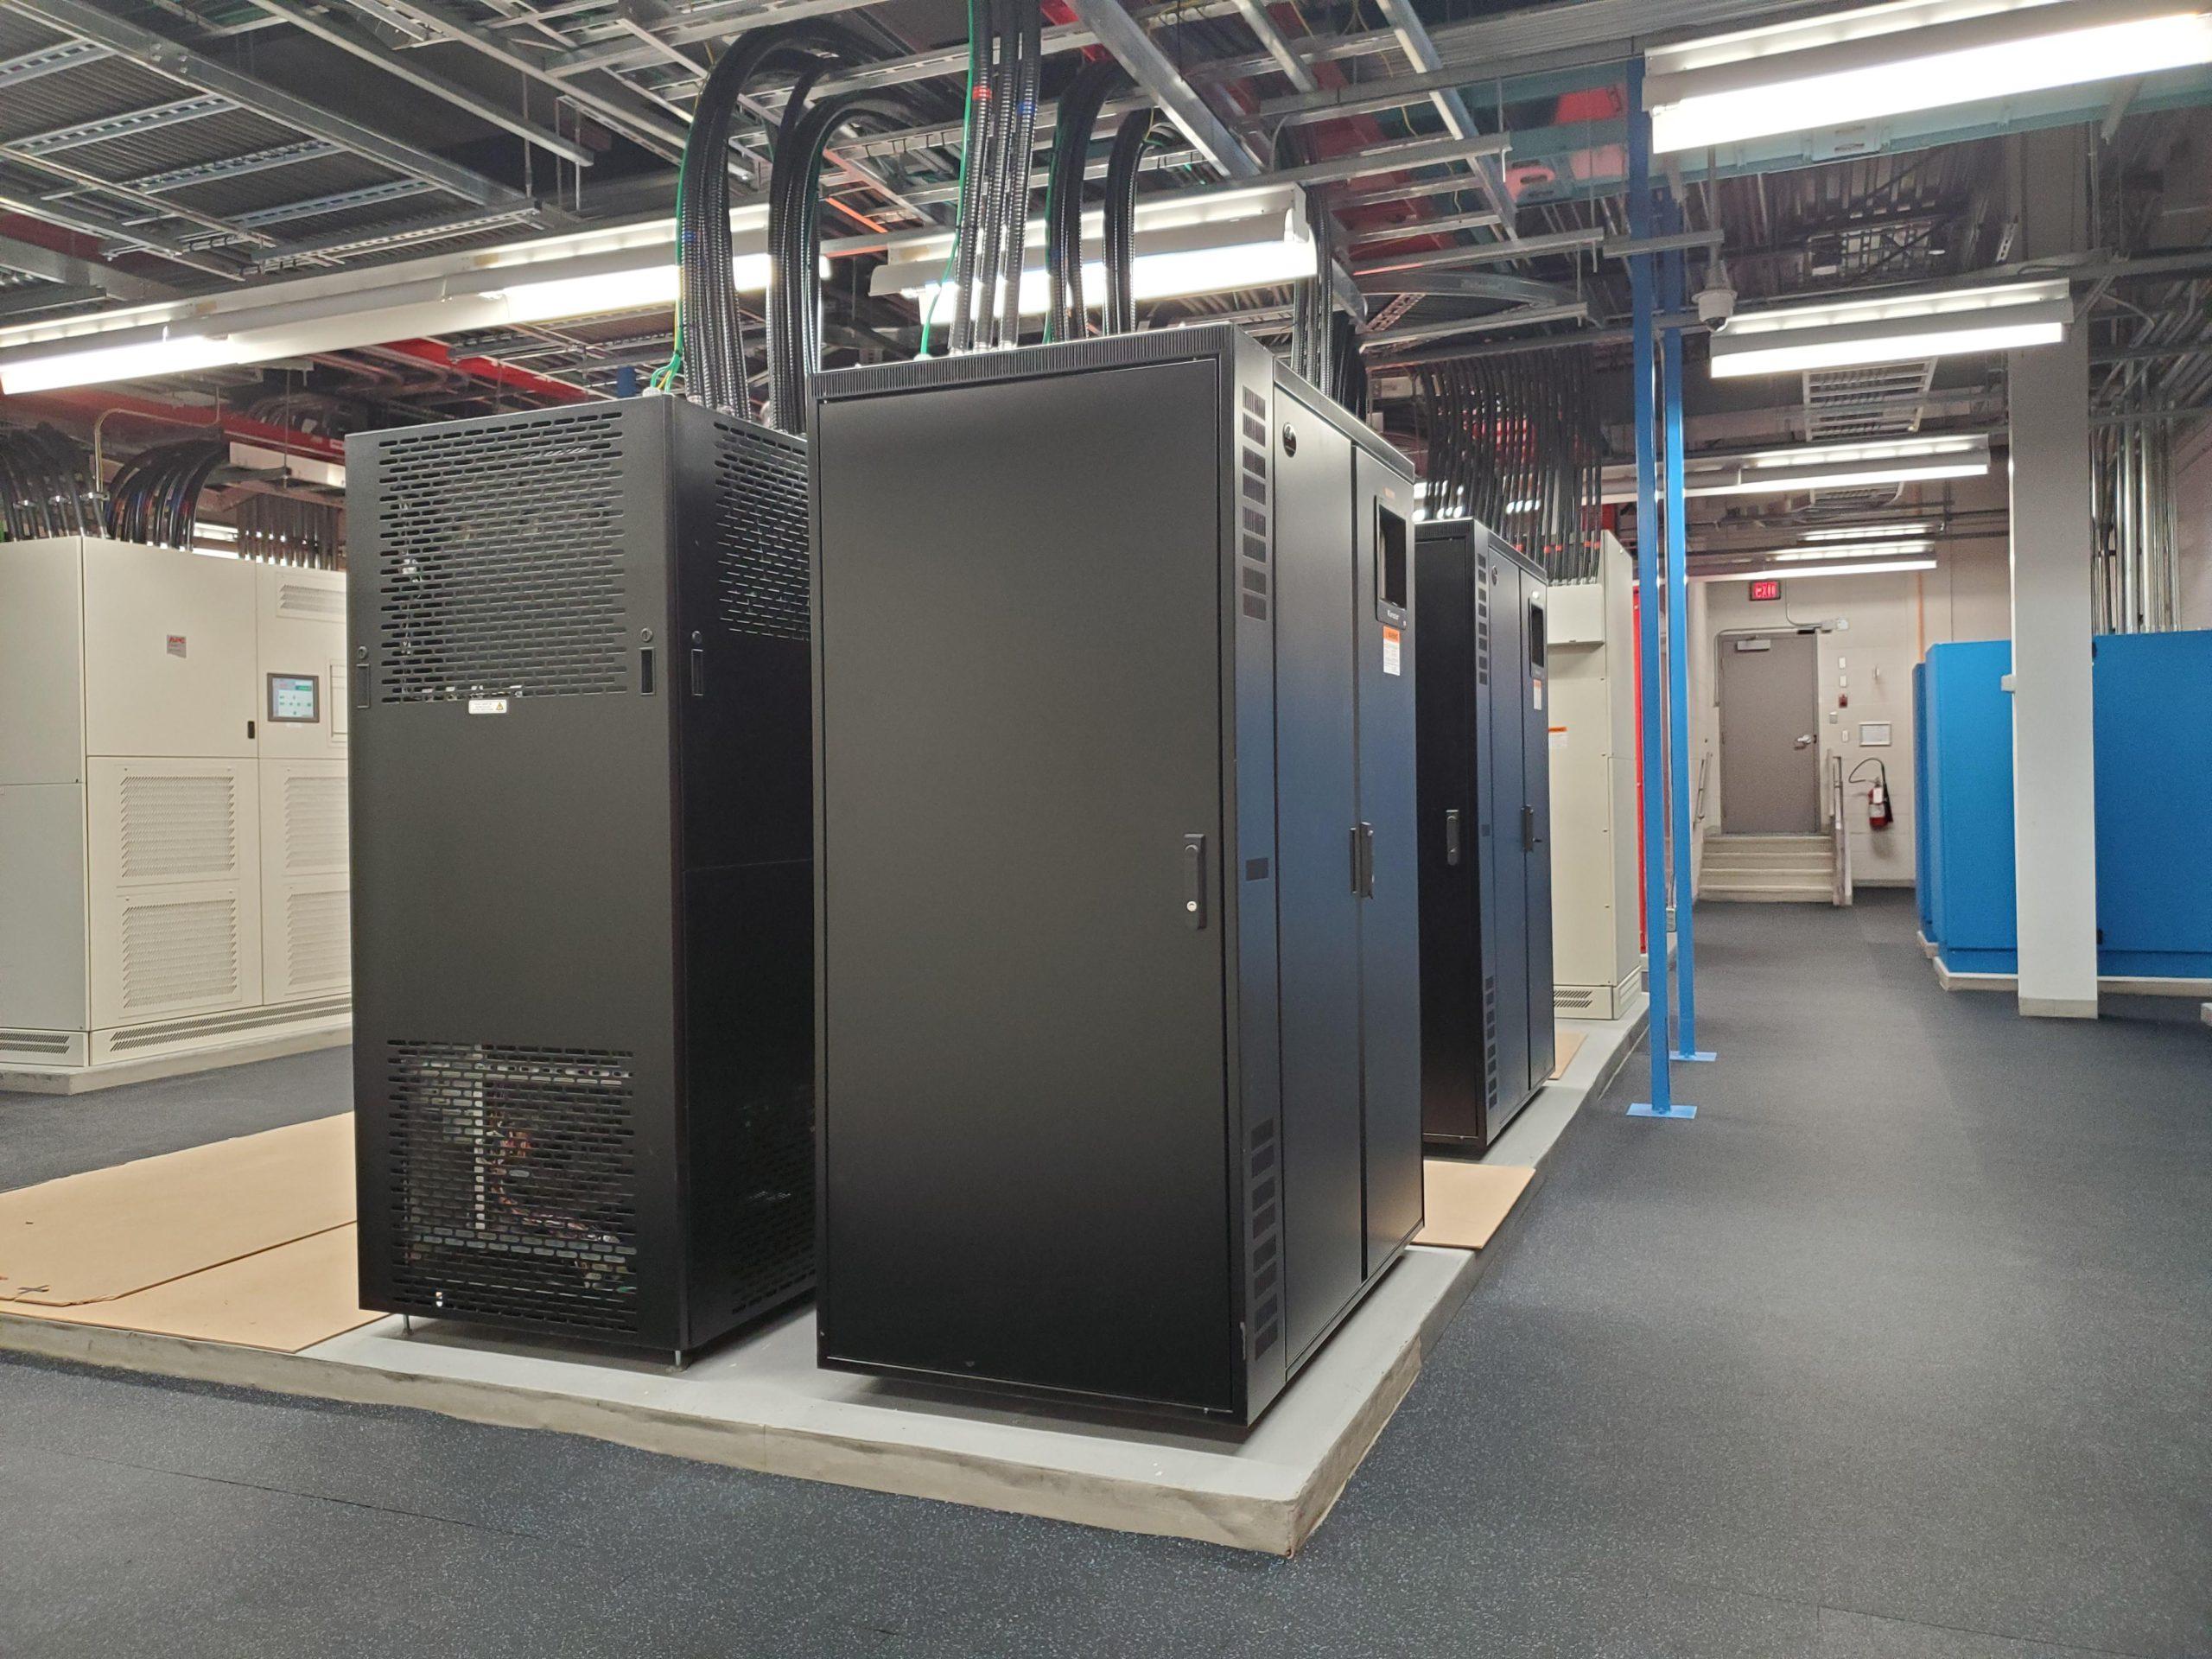 data centre hardware decorative